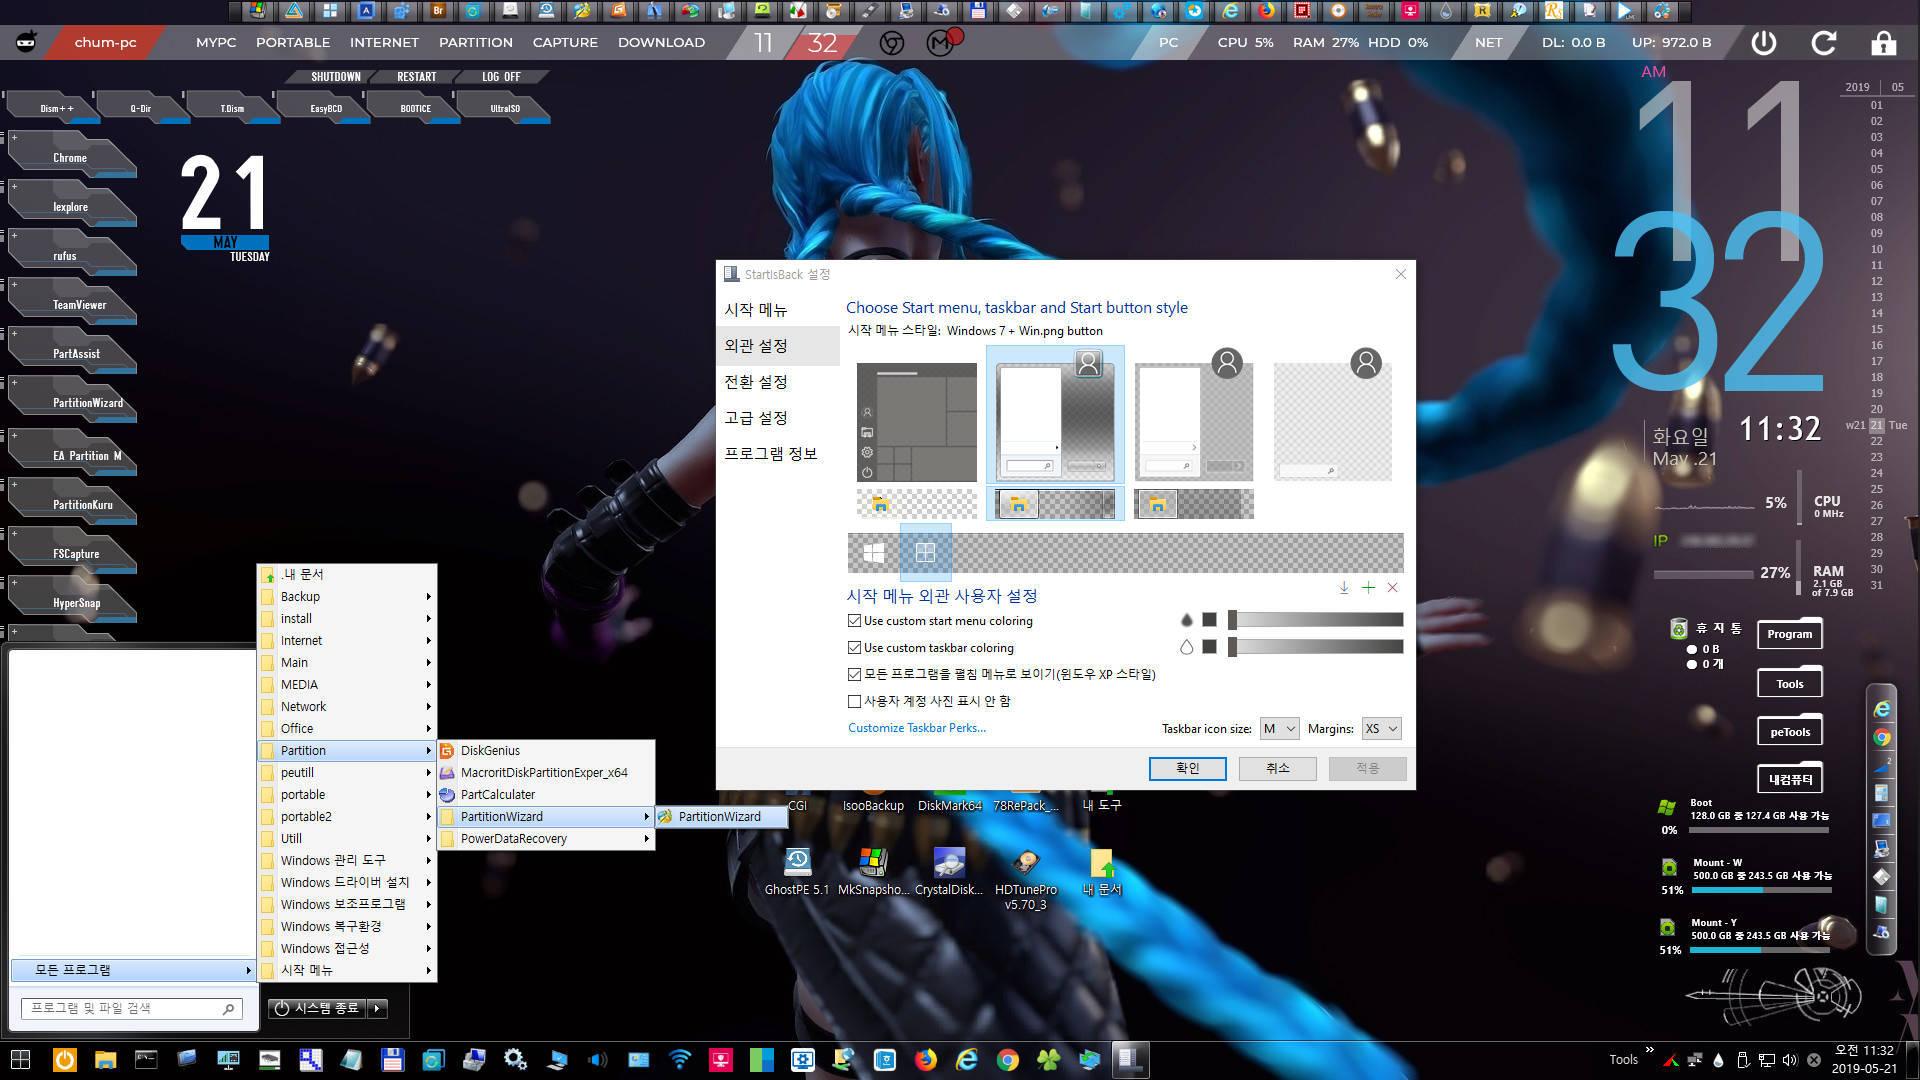 Win10XPE_x64_Chum_190520_0004.jpg